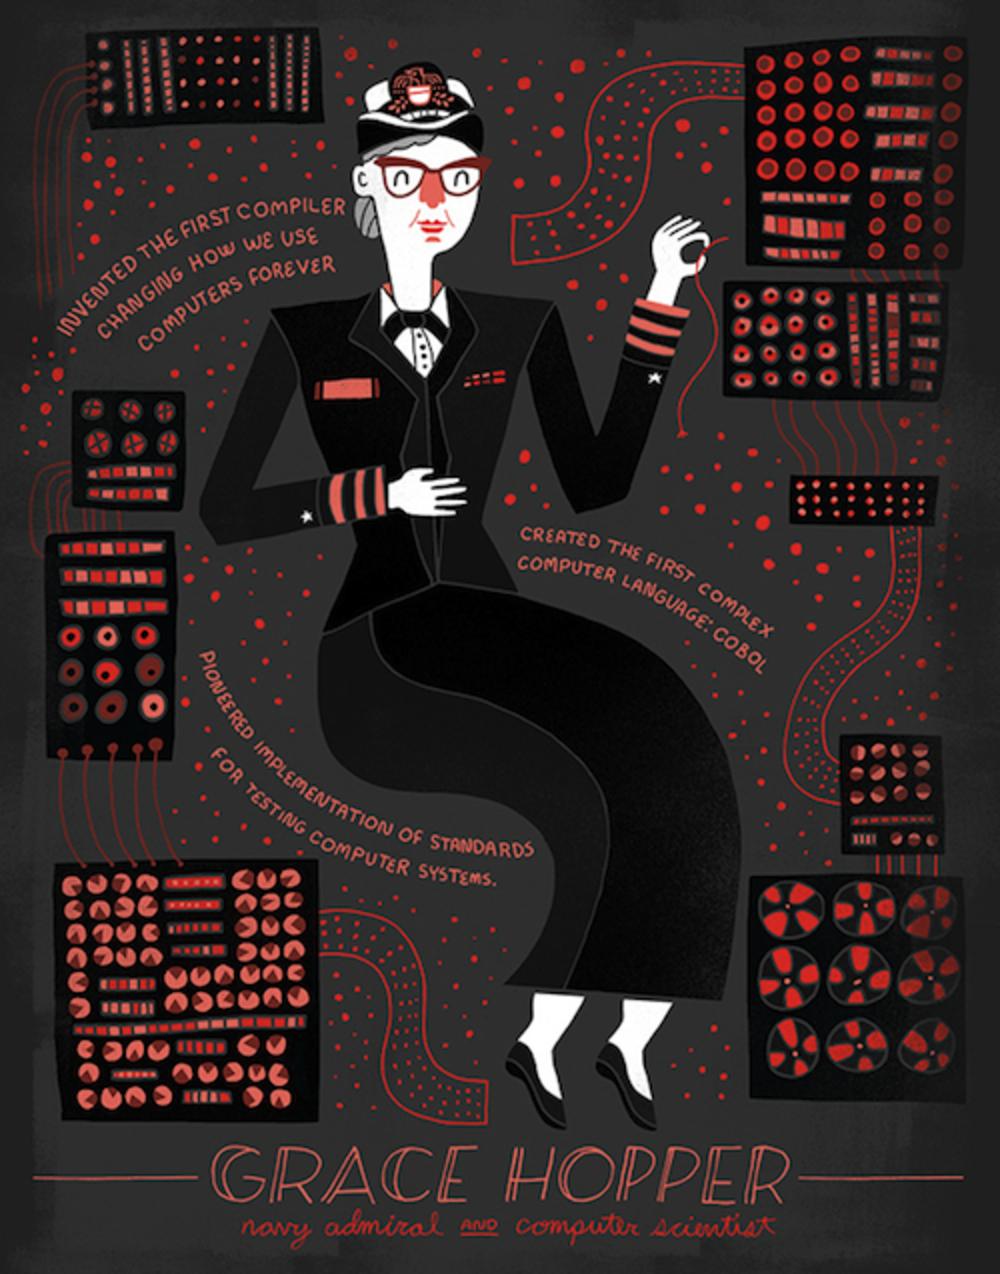 Grace Hopper by Rachel Ignotofsky